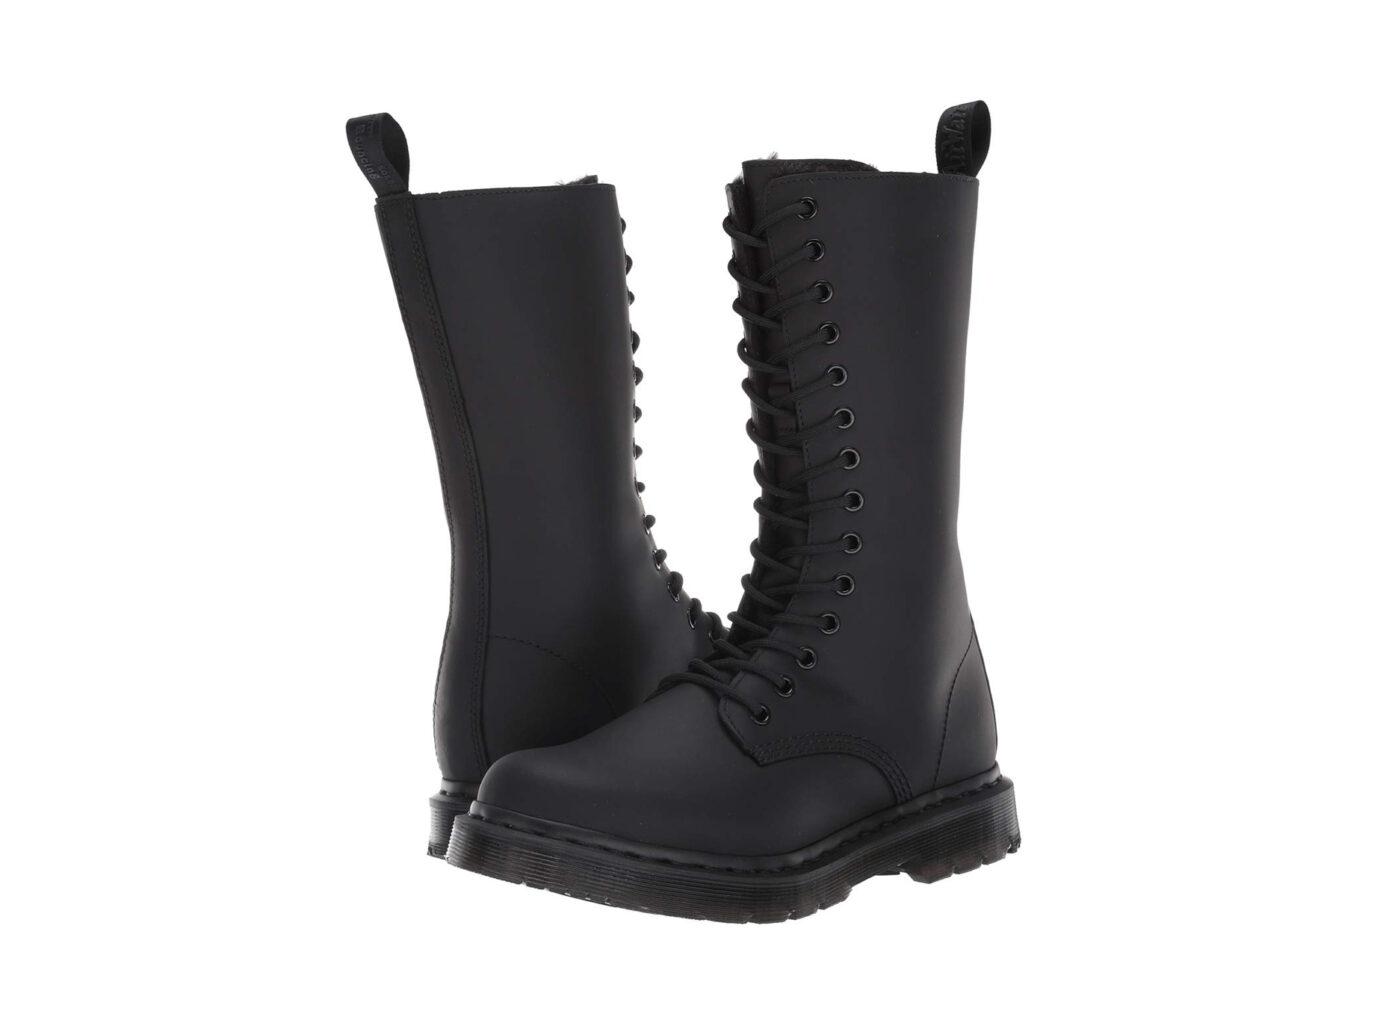 25 Best Women S Winter Boots Cute Snow Boots To Shop Now Jetsetter